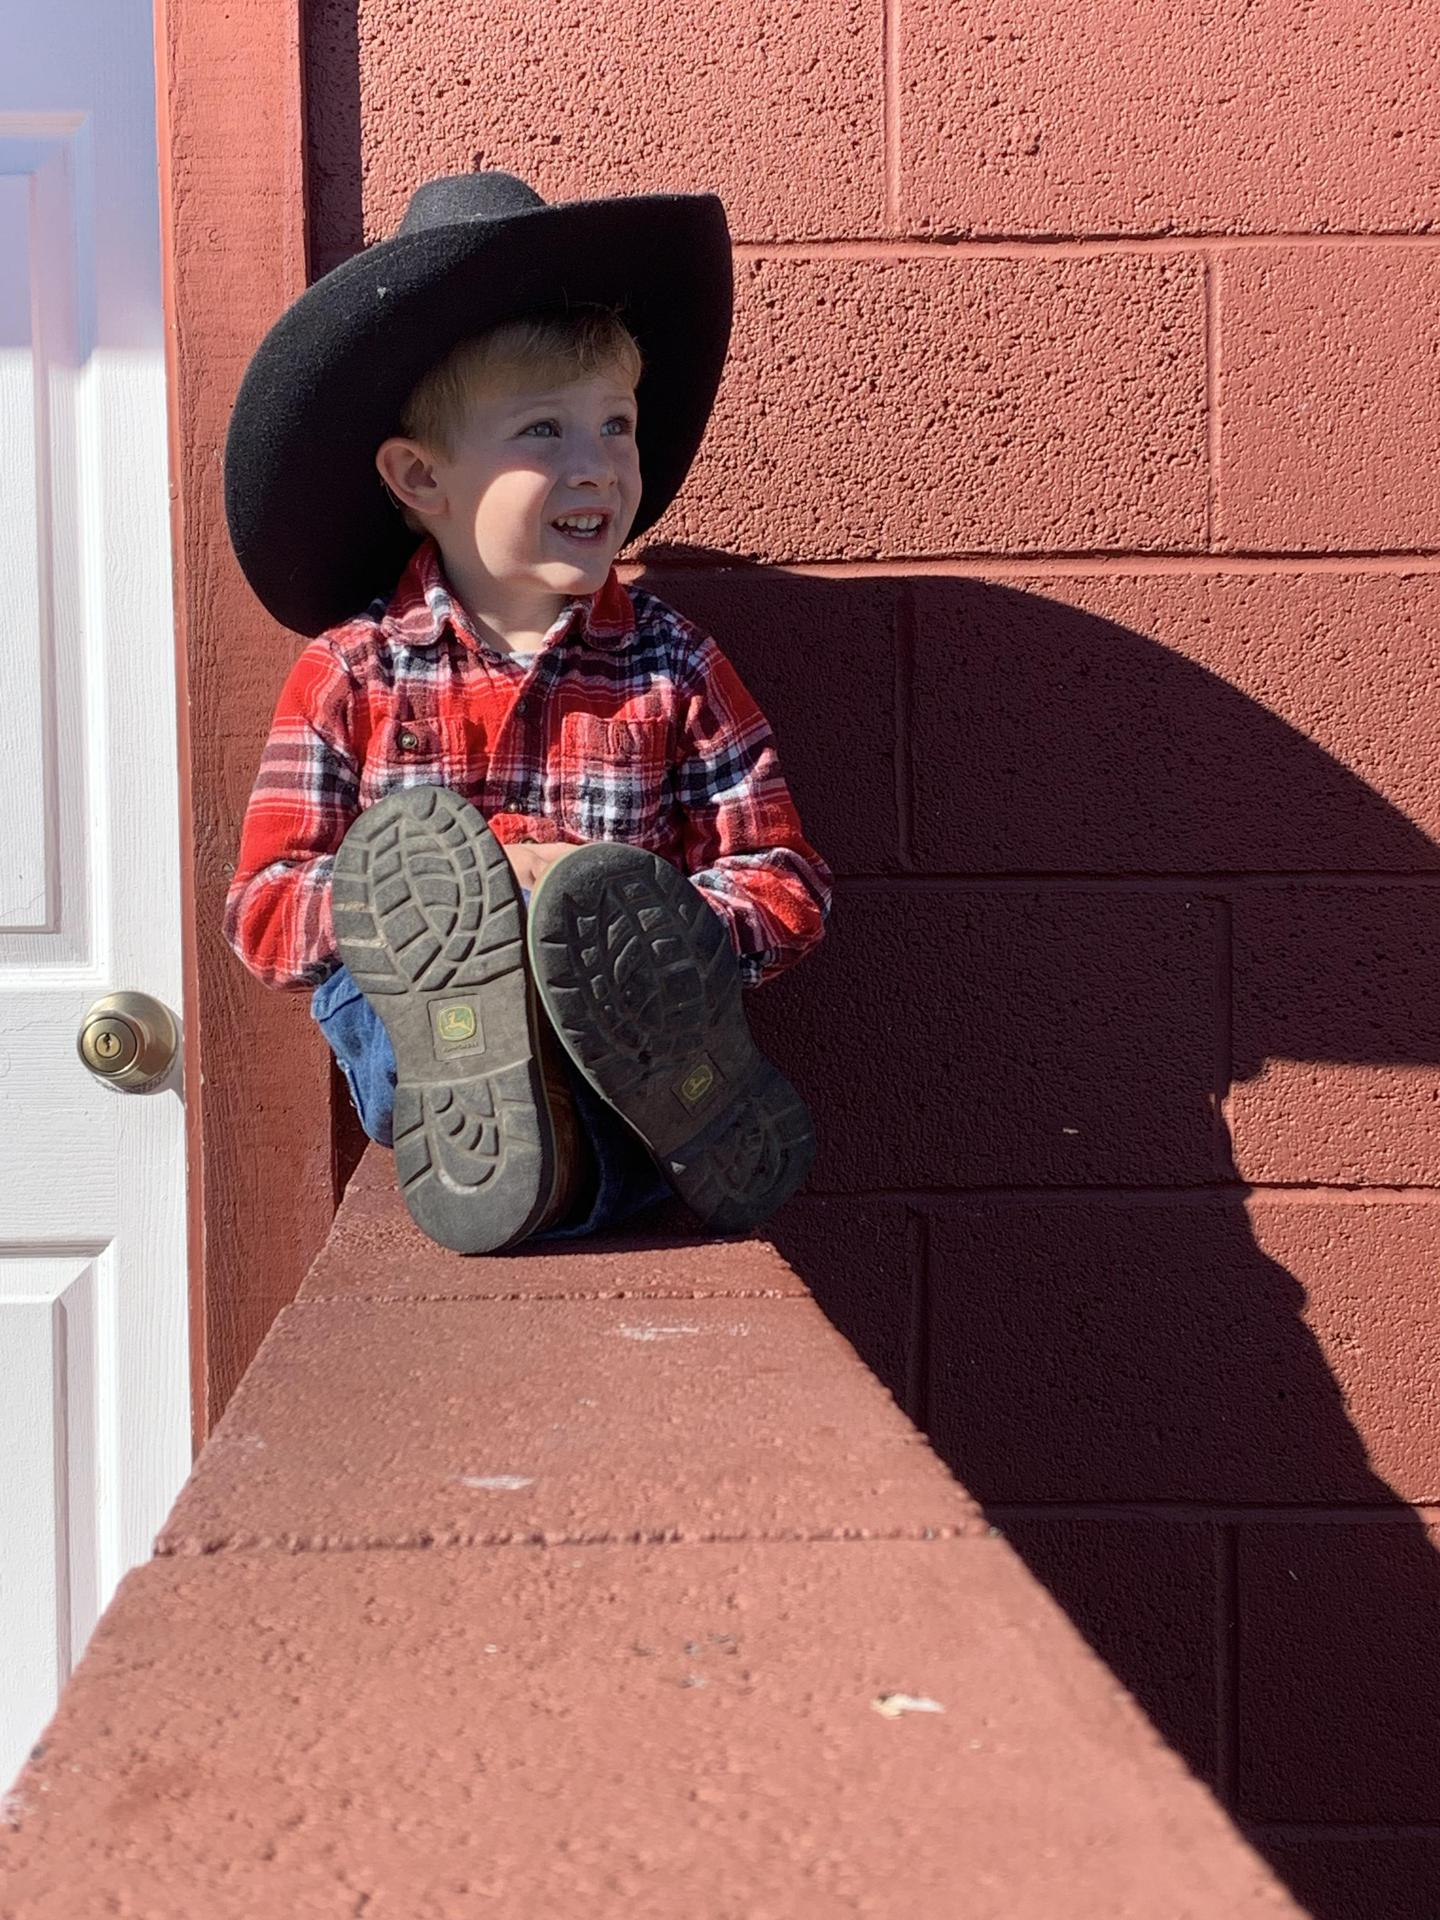 My son Wyatt